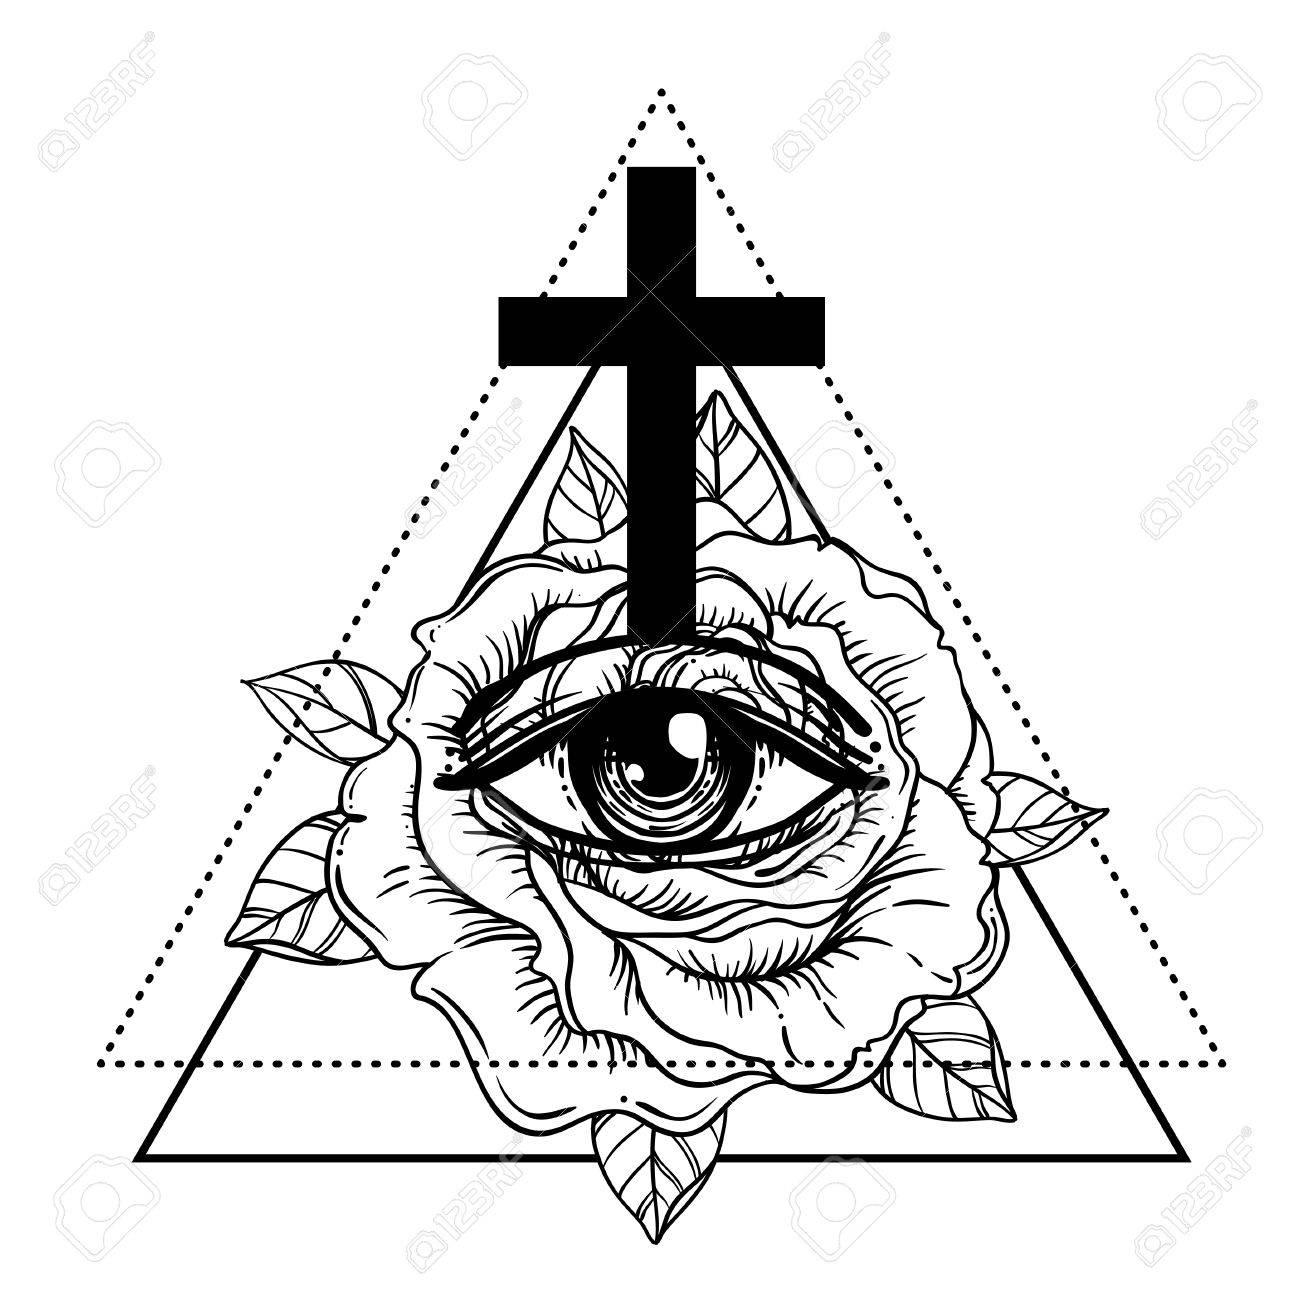 Rosicrucianism symbol. Blackwork tattoo flash. All seeing eye, Cristian cross with rose flower. Sacred geometry. Vector illustration isolated on white. Tattoo design, mystic symbol. New World Order. - 79138199